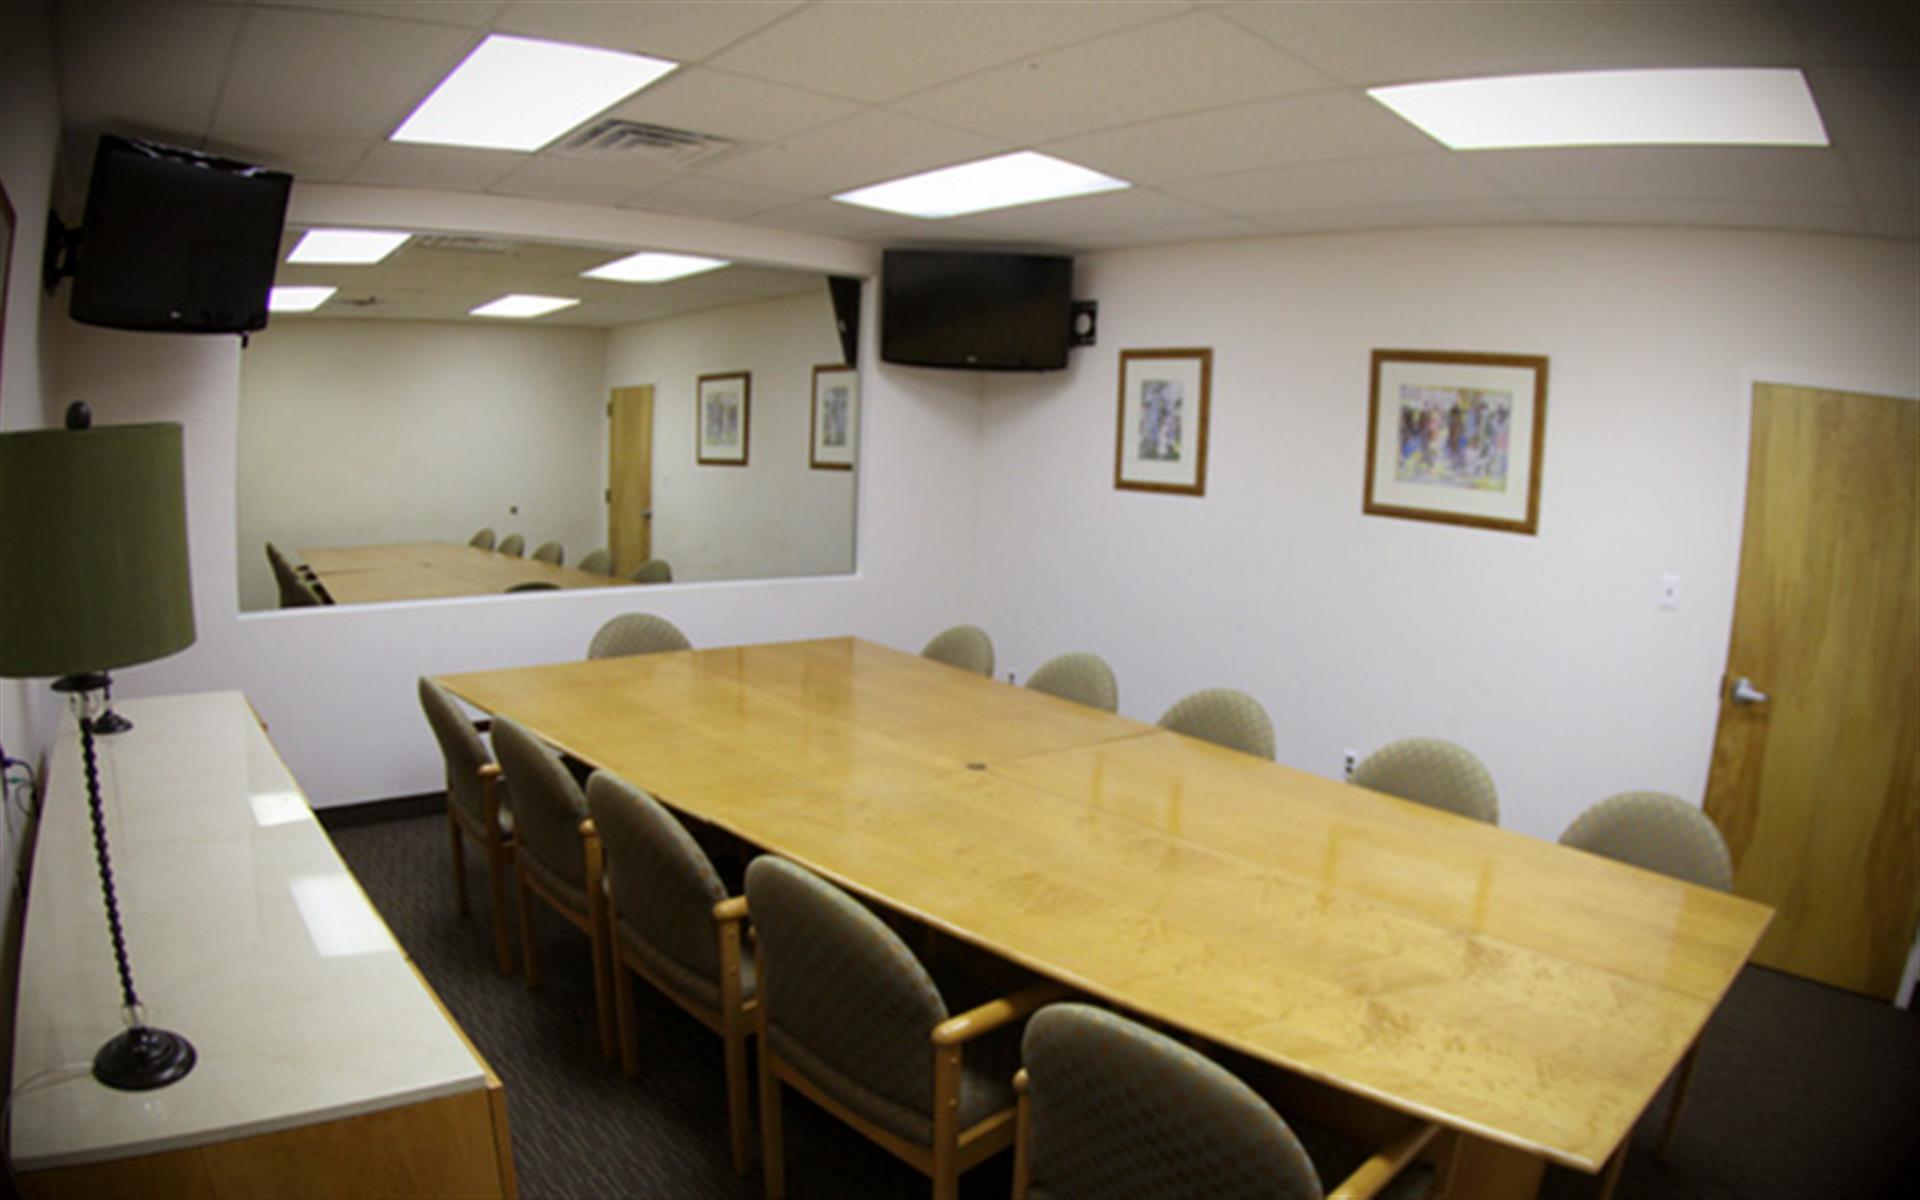 I.C. International - Group Focus & Viewing Room